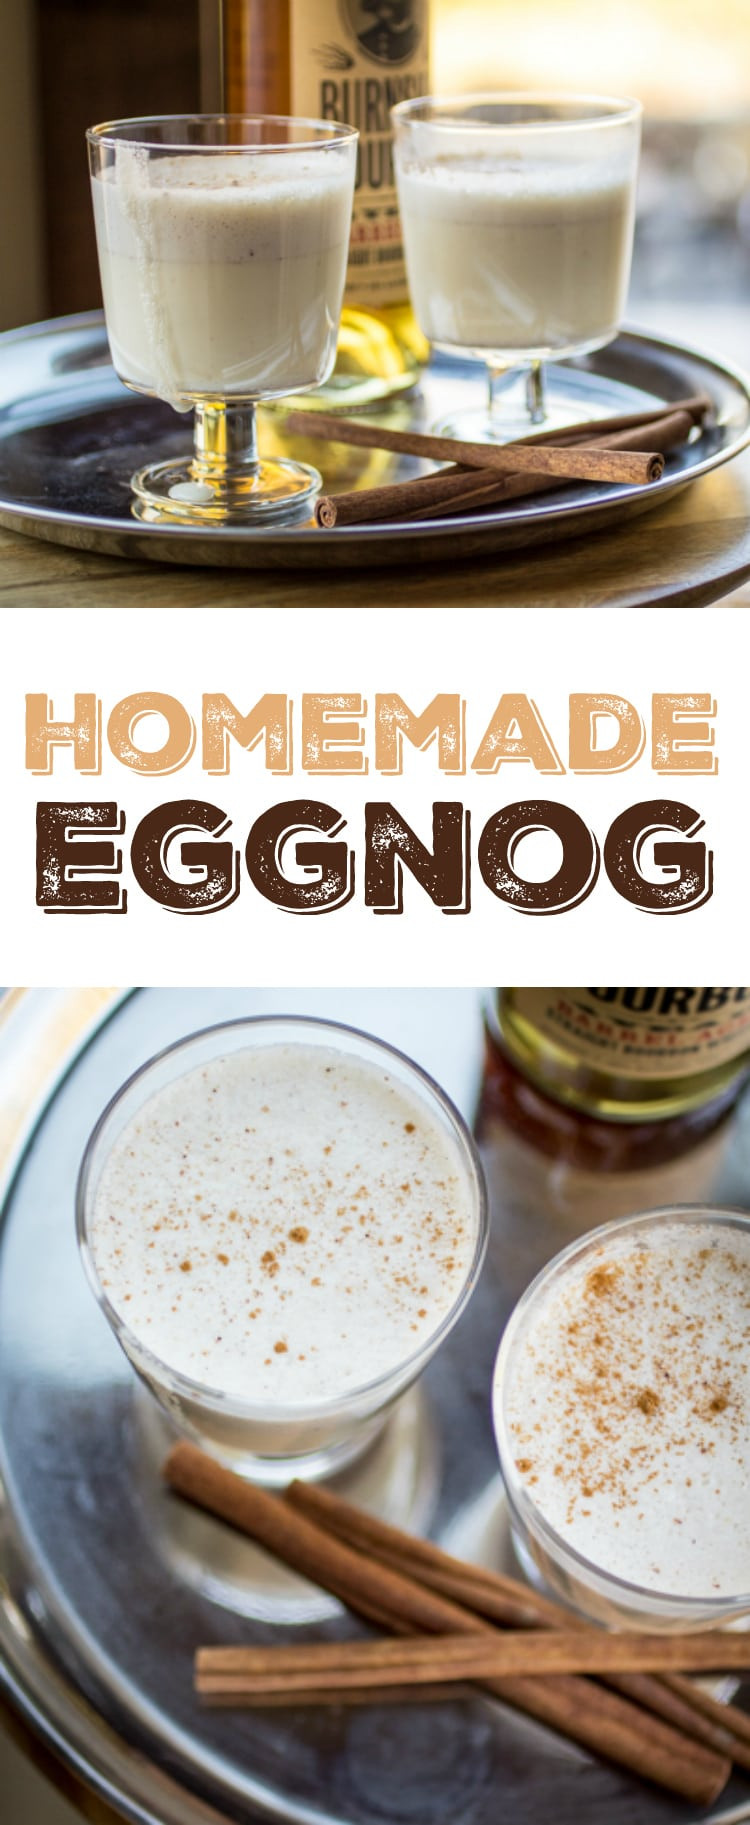 Best Homemade Eggnog  Homemade Eggnog The Wanderlust Kitchen